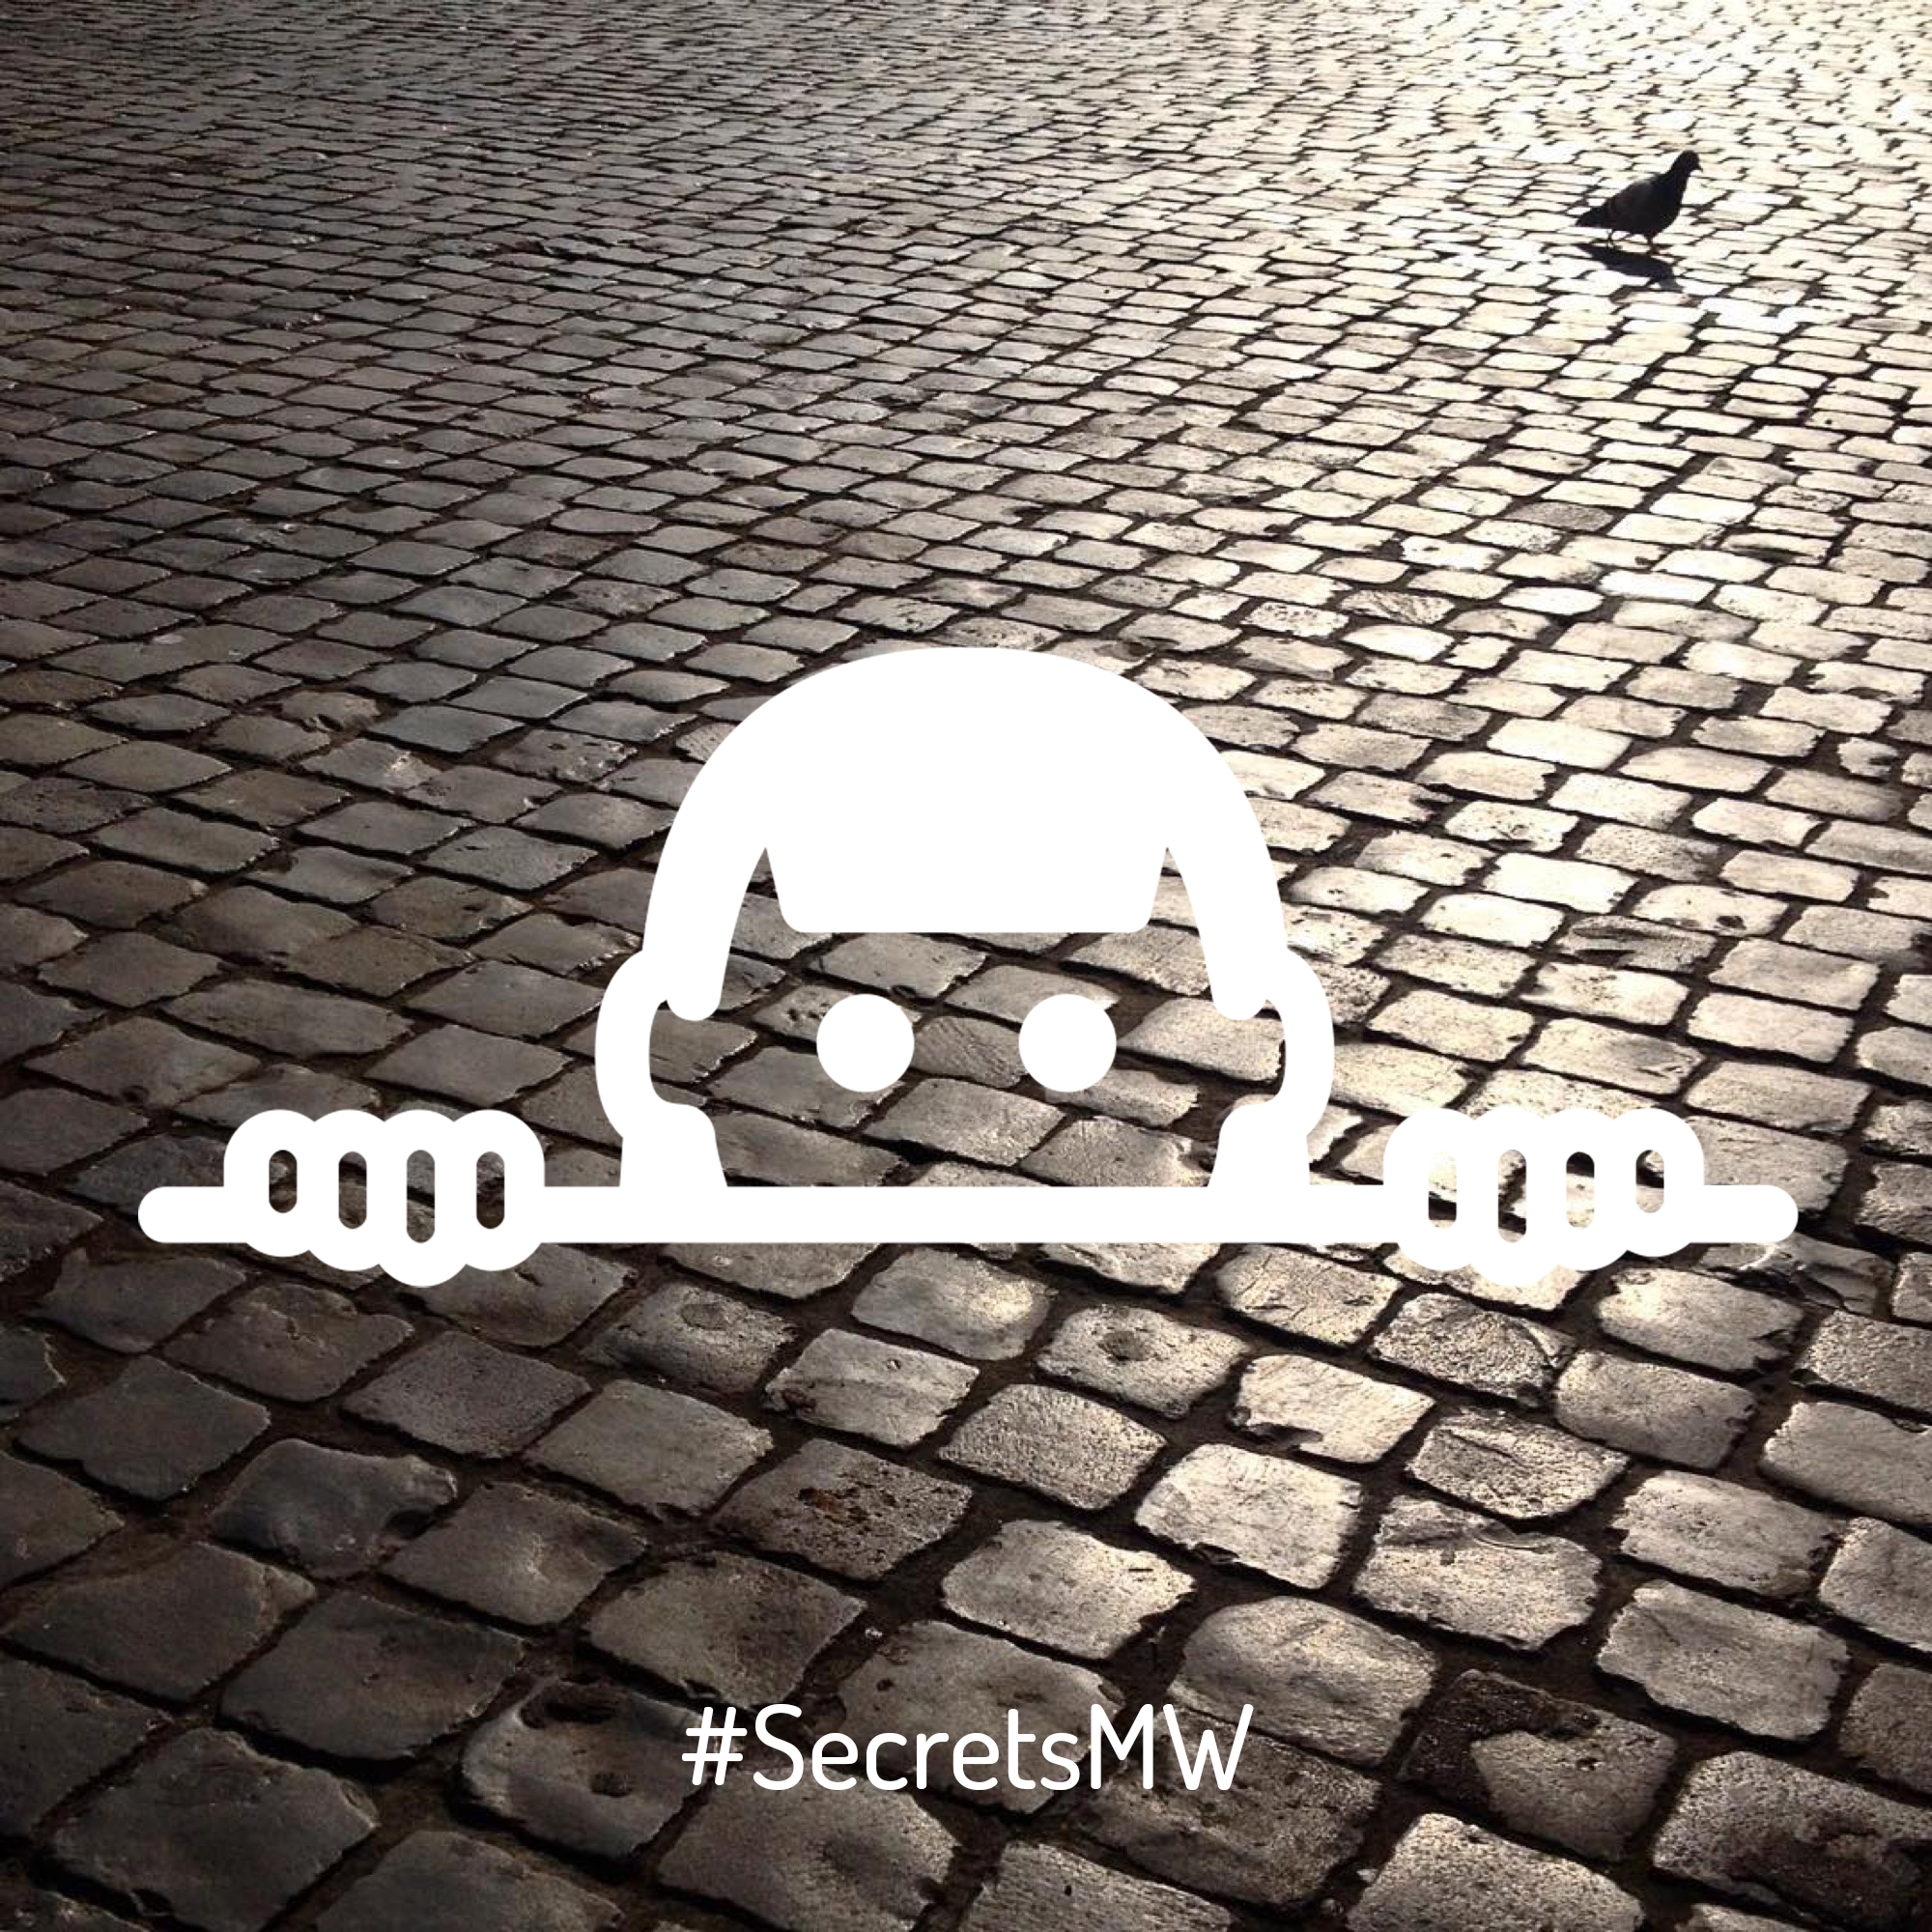 #SecretsMW